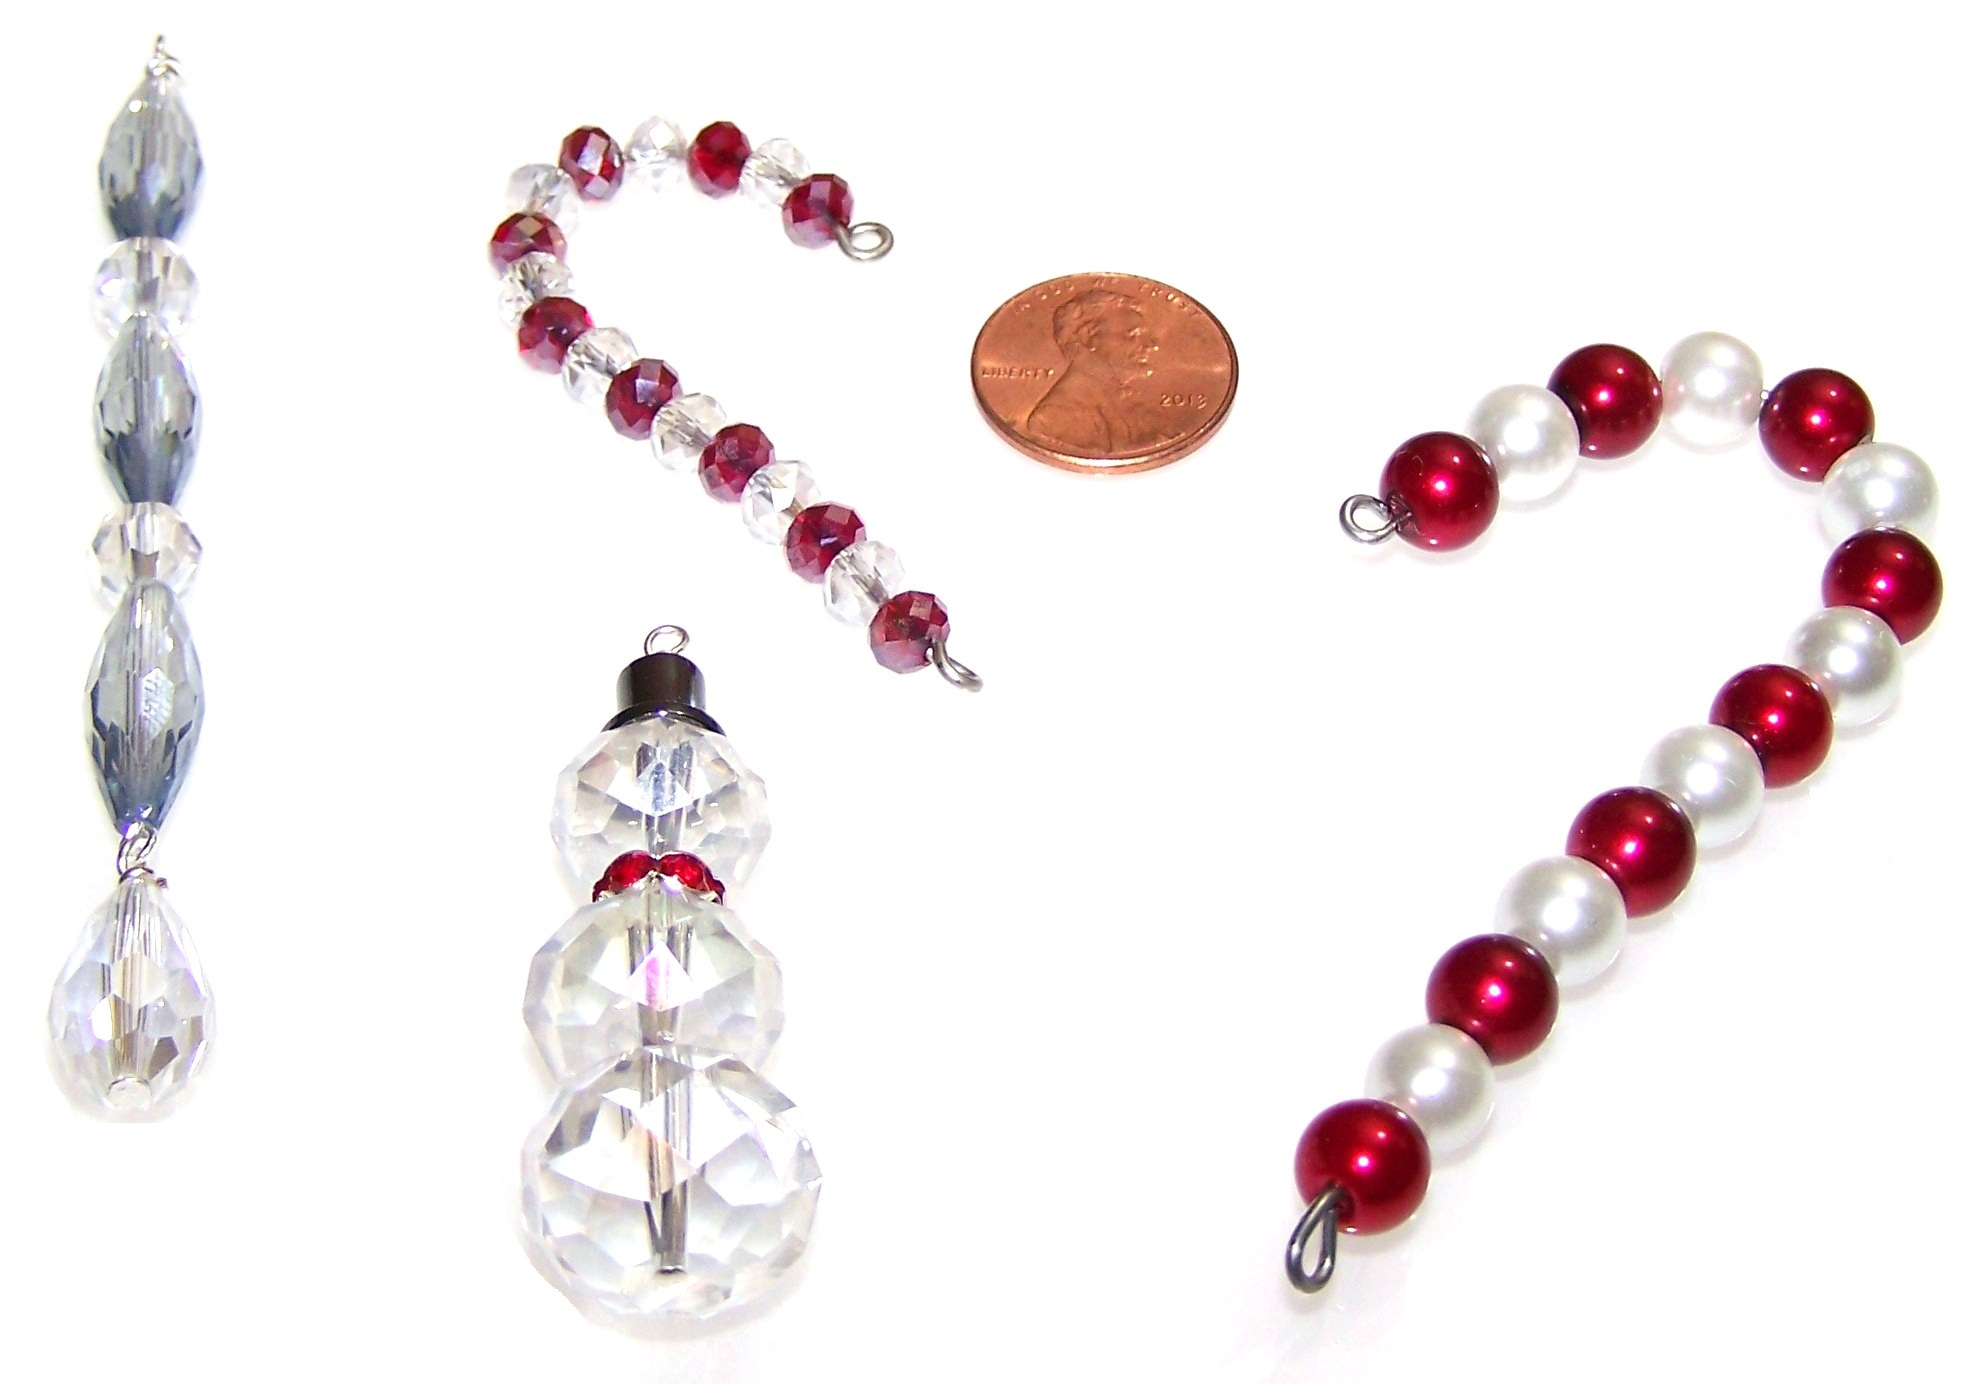 Mini Beaded Christmas Ornament Making Kits Bead 3